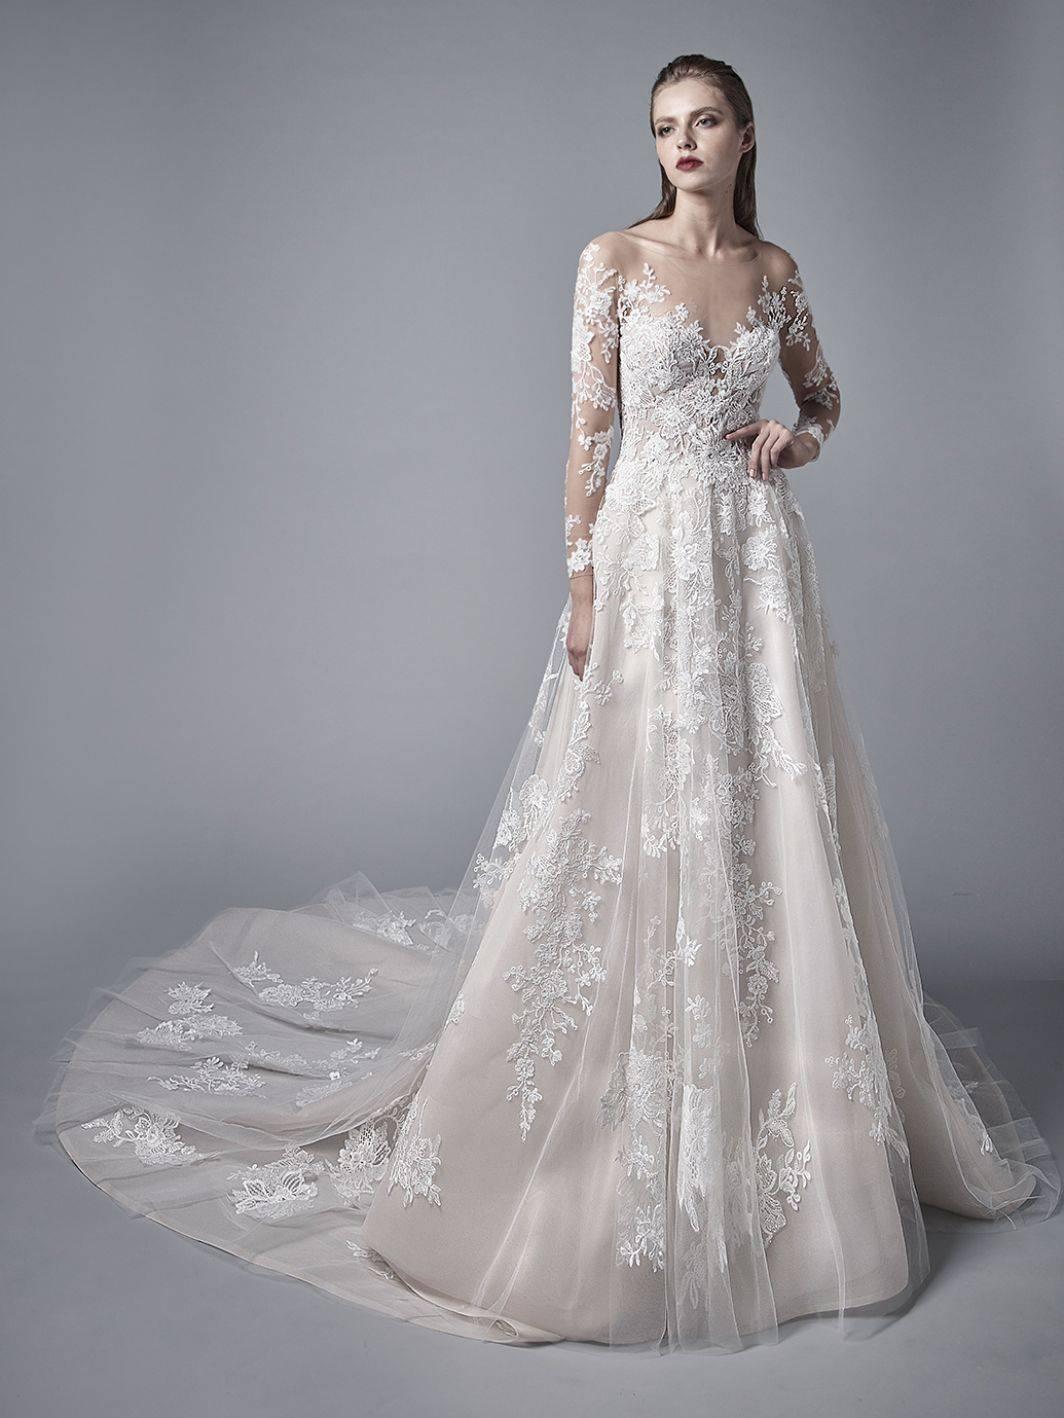 ENZOANI LYSANDRA WEDDING DRESS